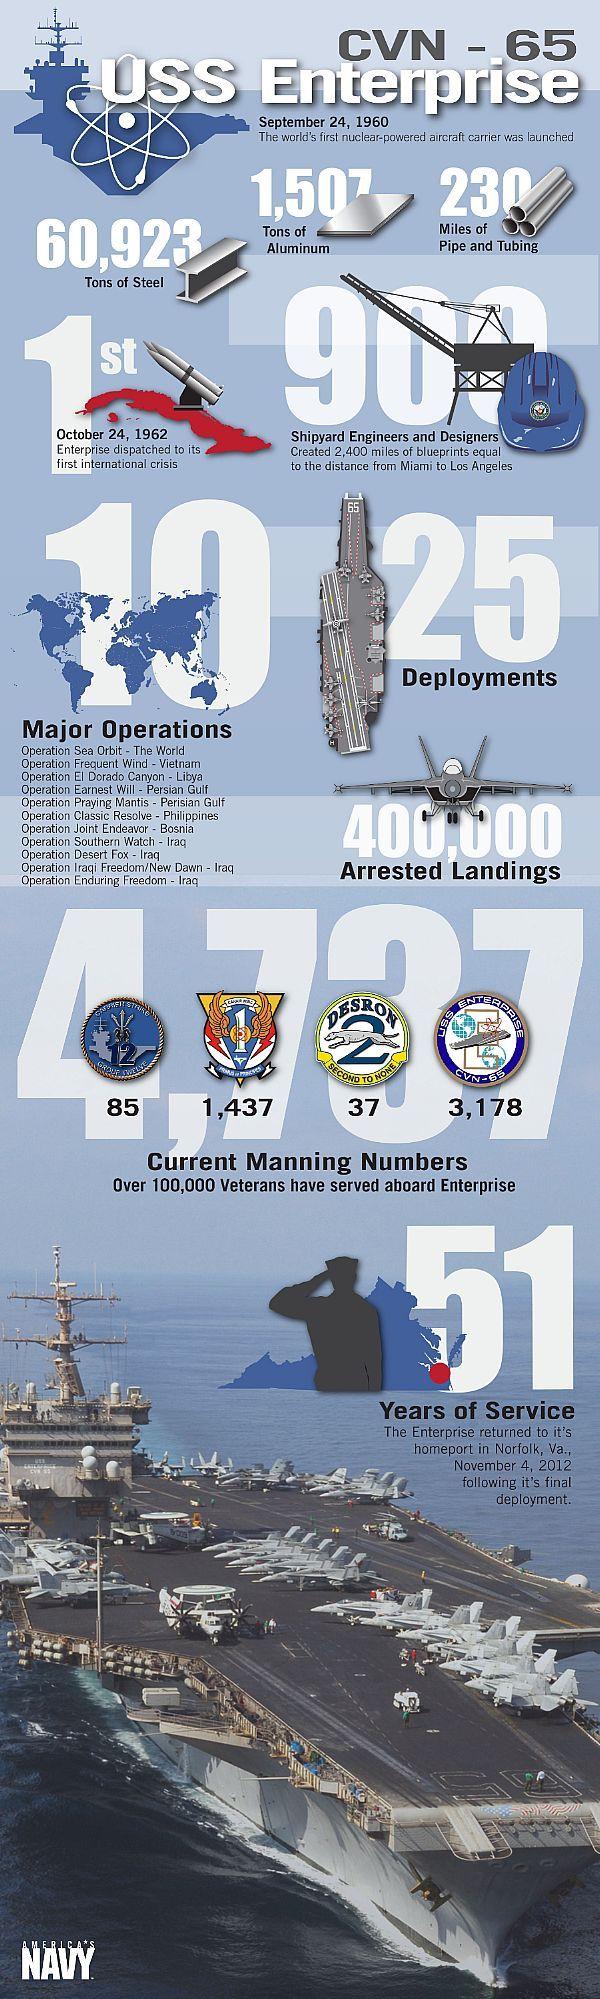 USS Enterprise returned to Norfolk in November 2012 after 51 years of #USNavy #service.